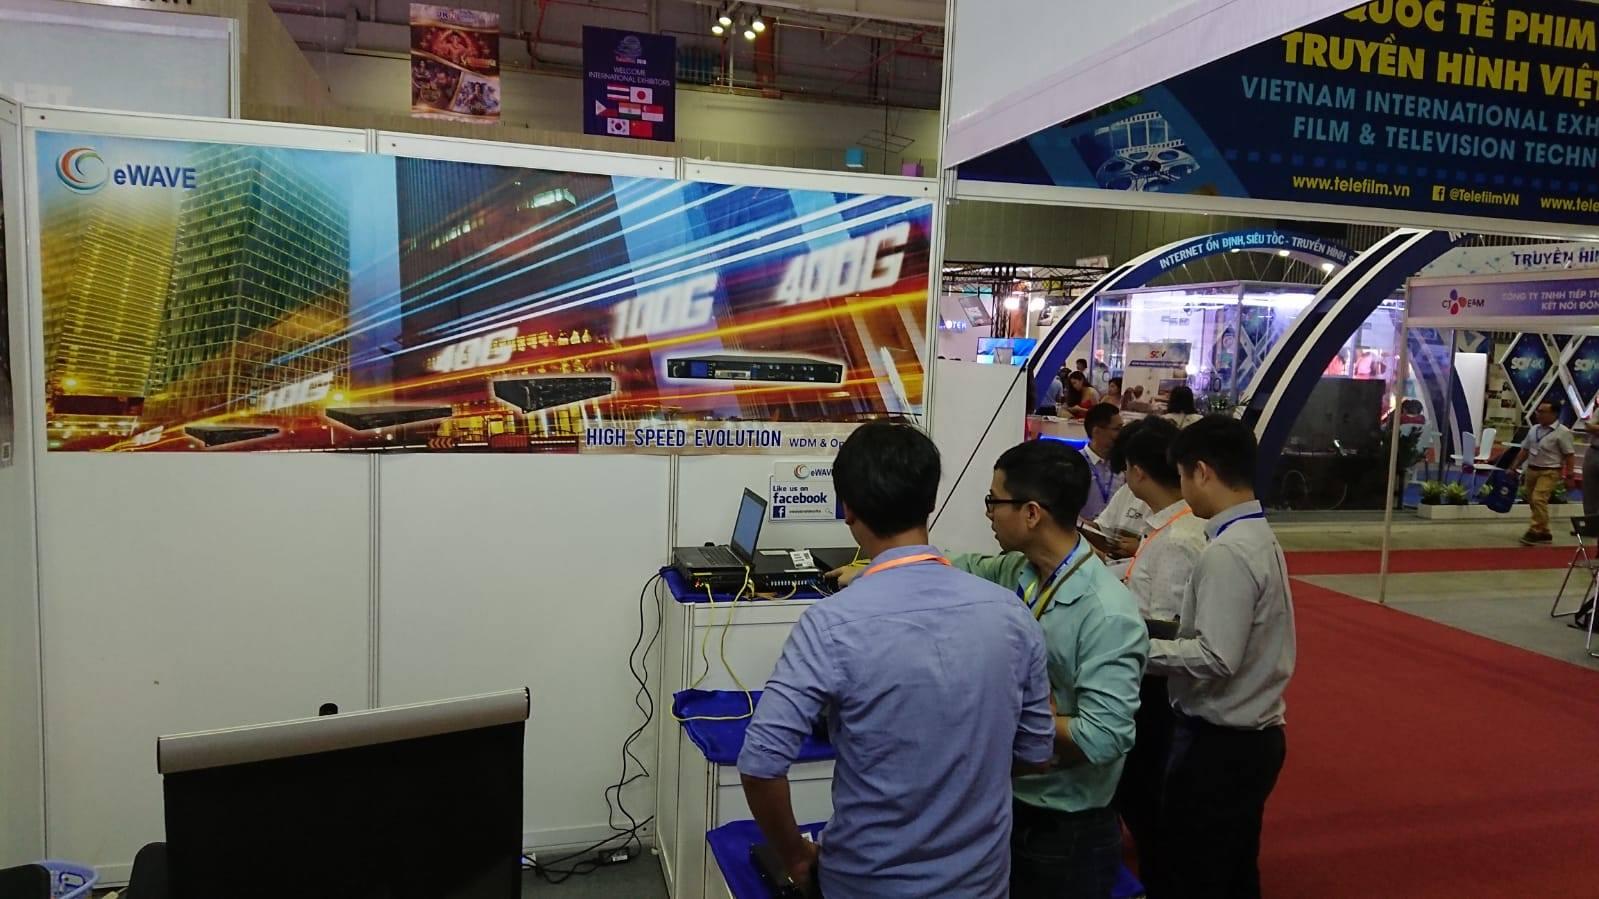 3rd Vietnam ICTCOMM 2018